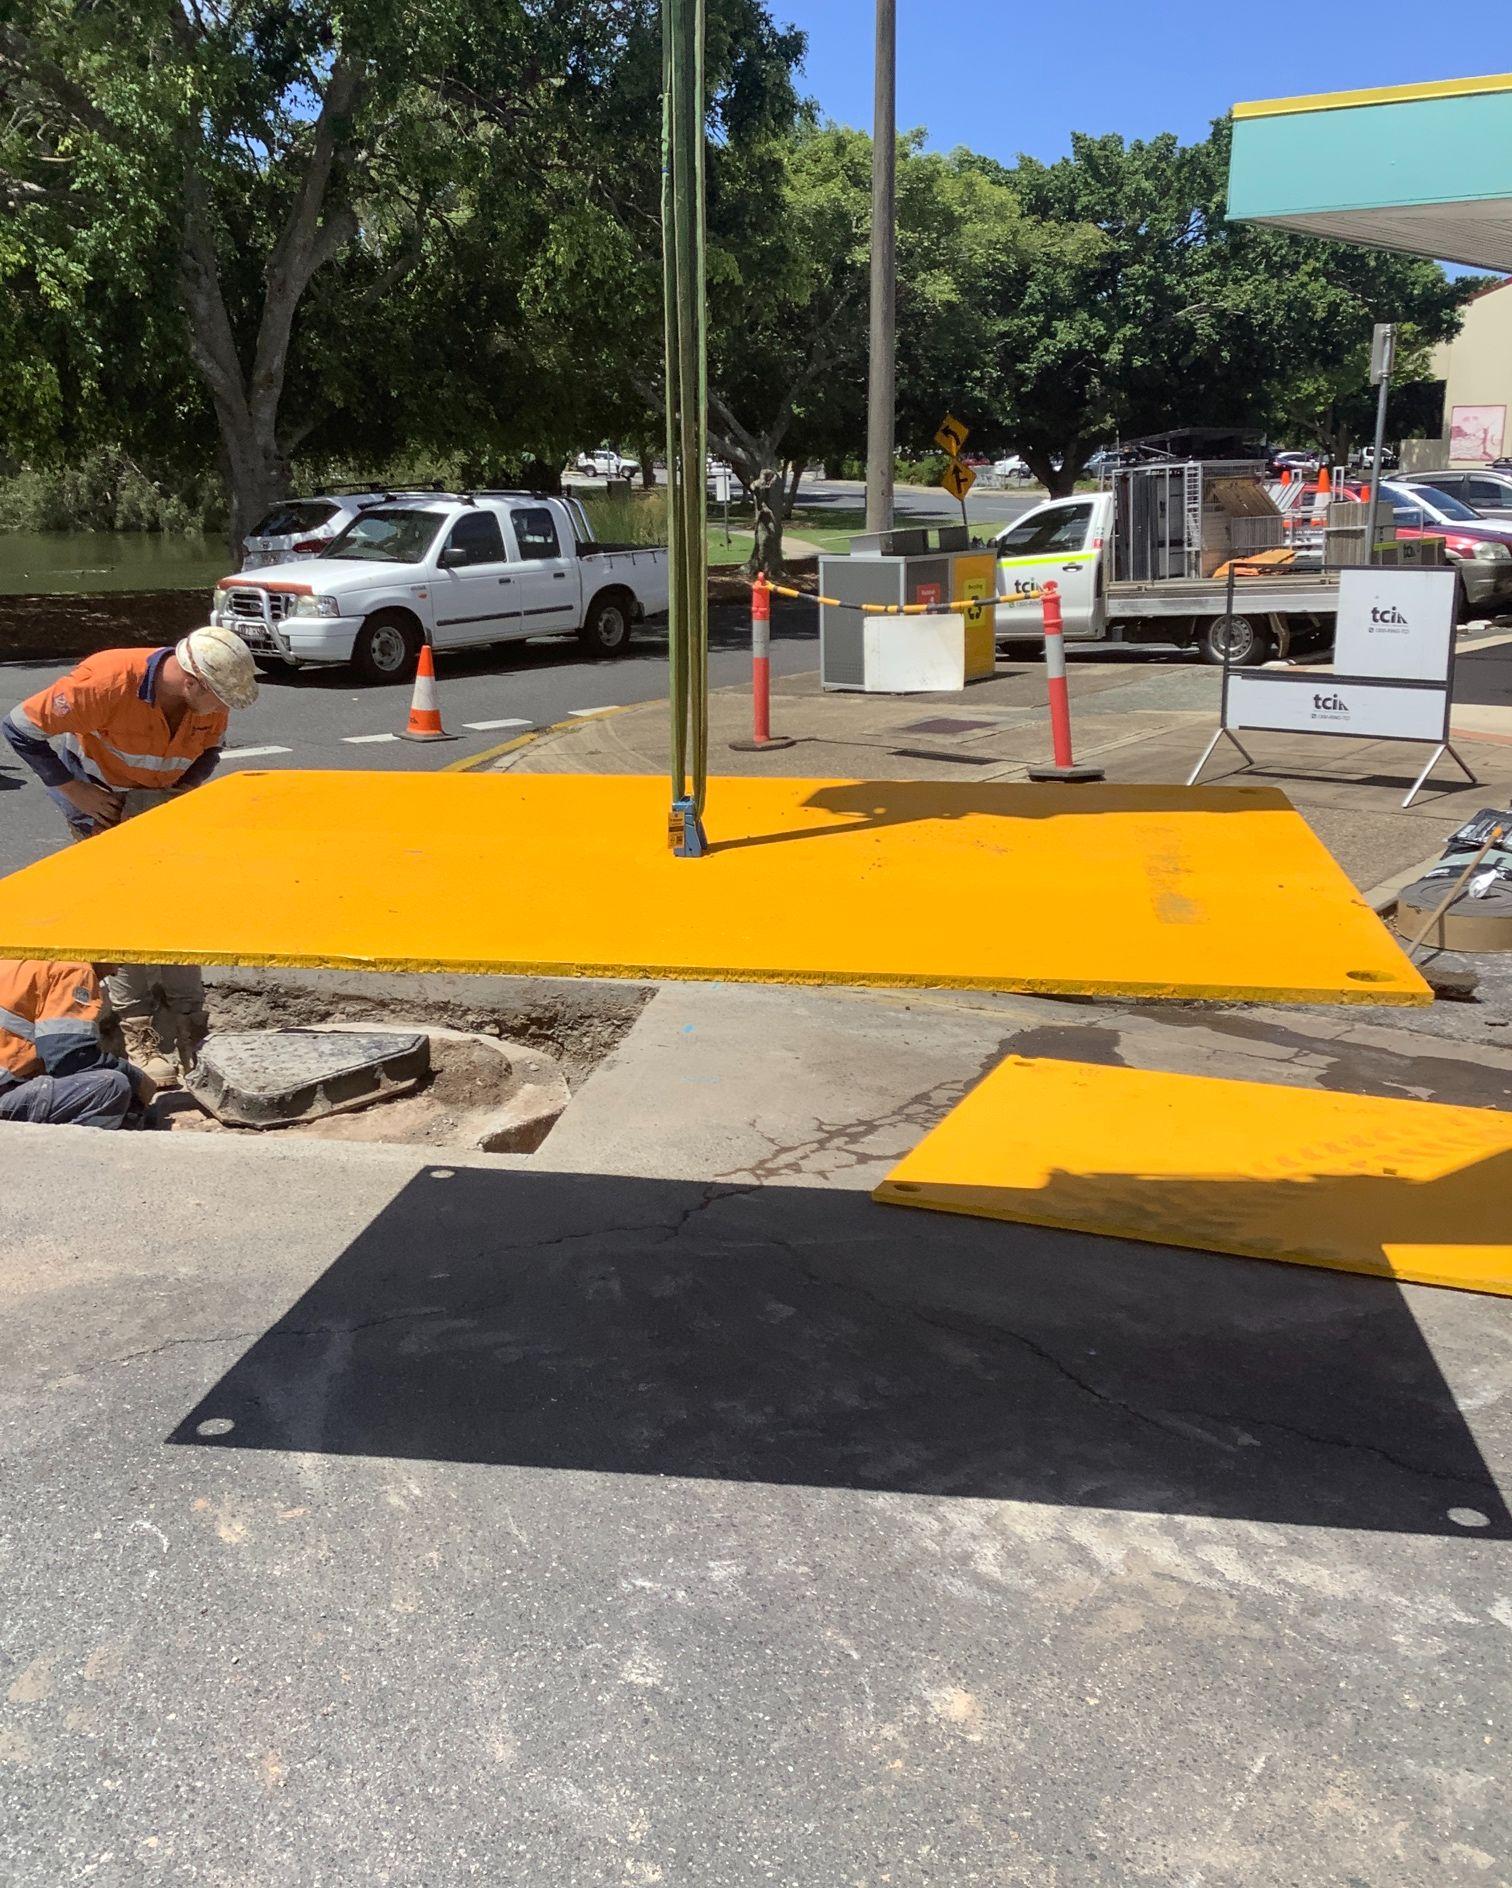 scopecranes steel road place hire in construction